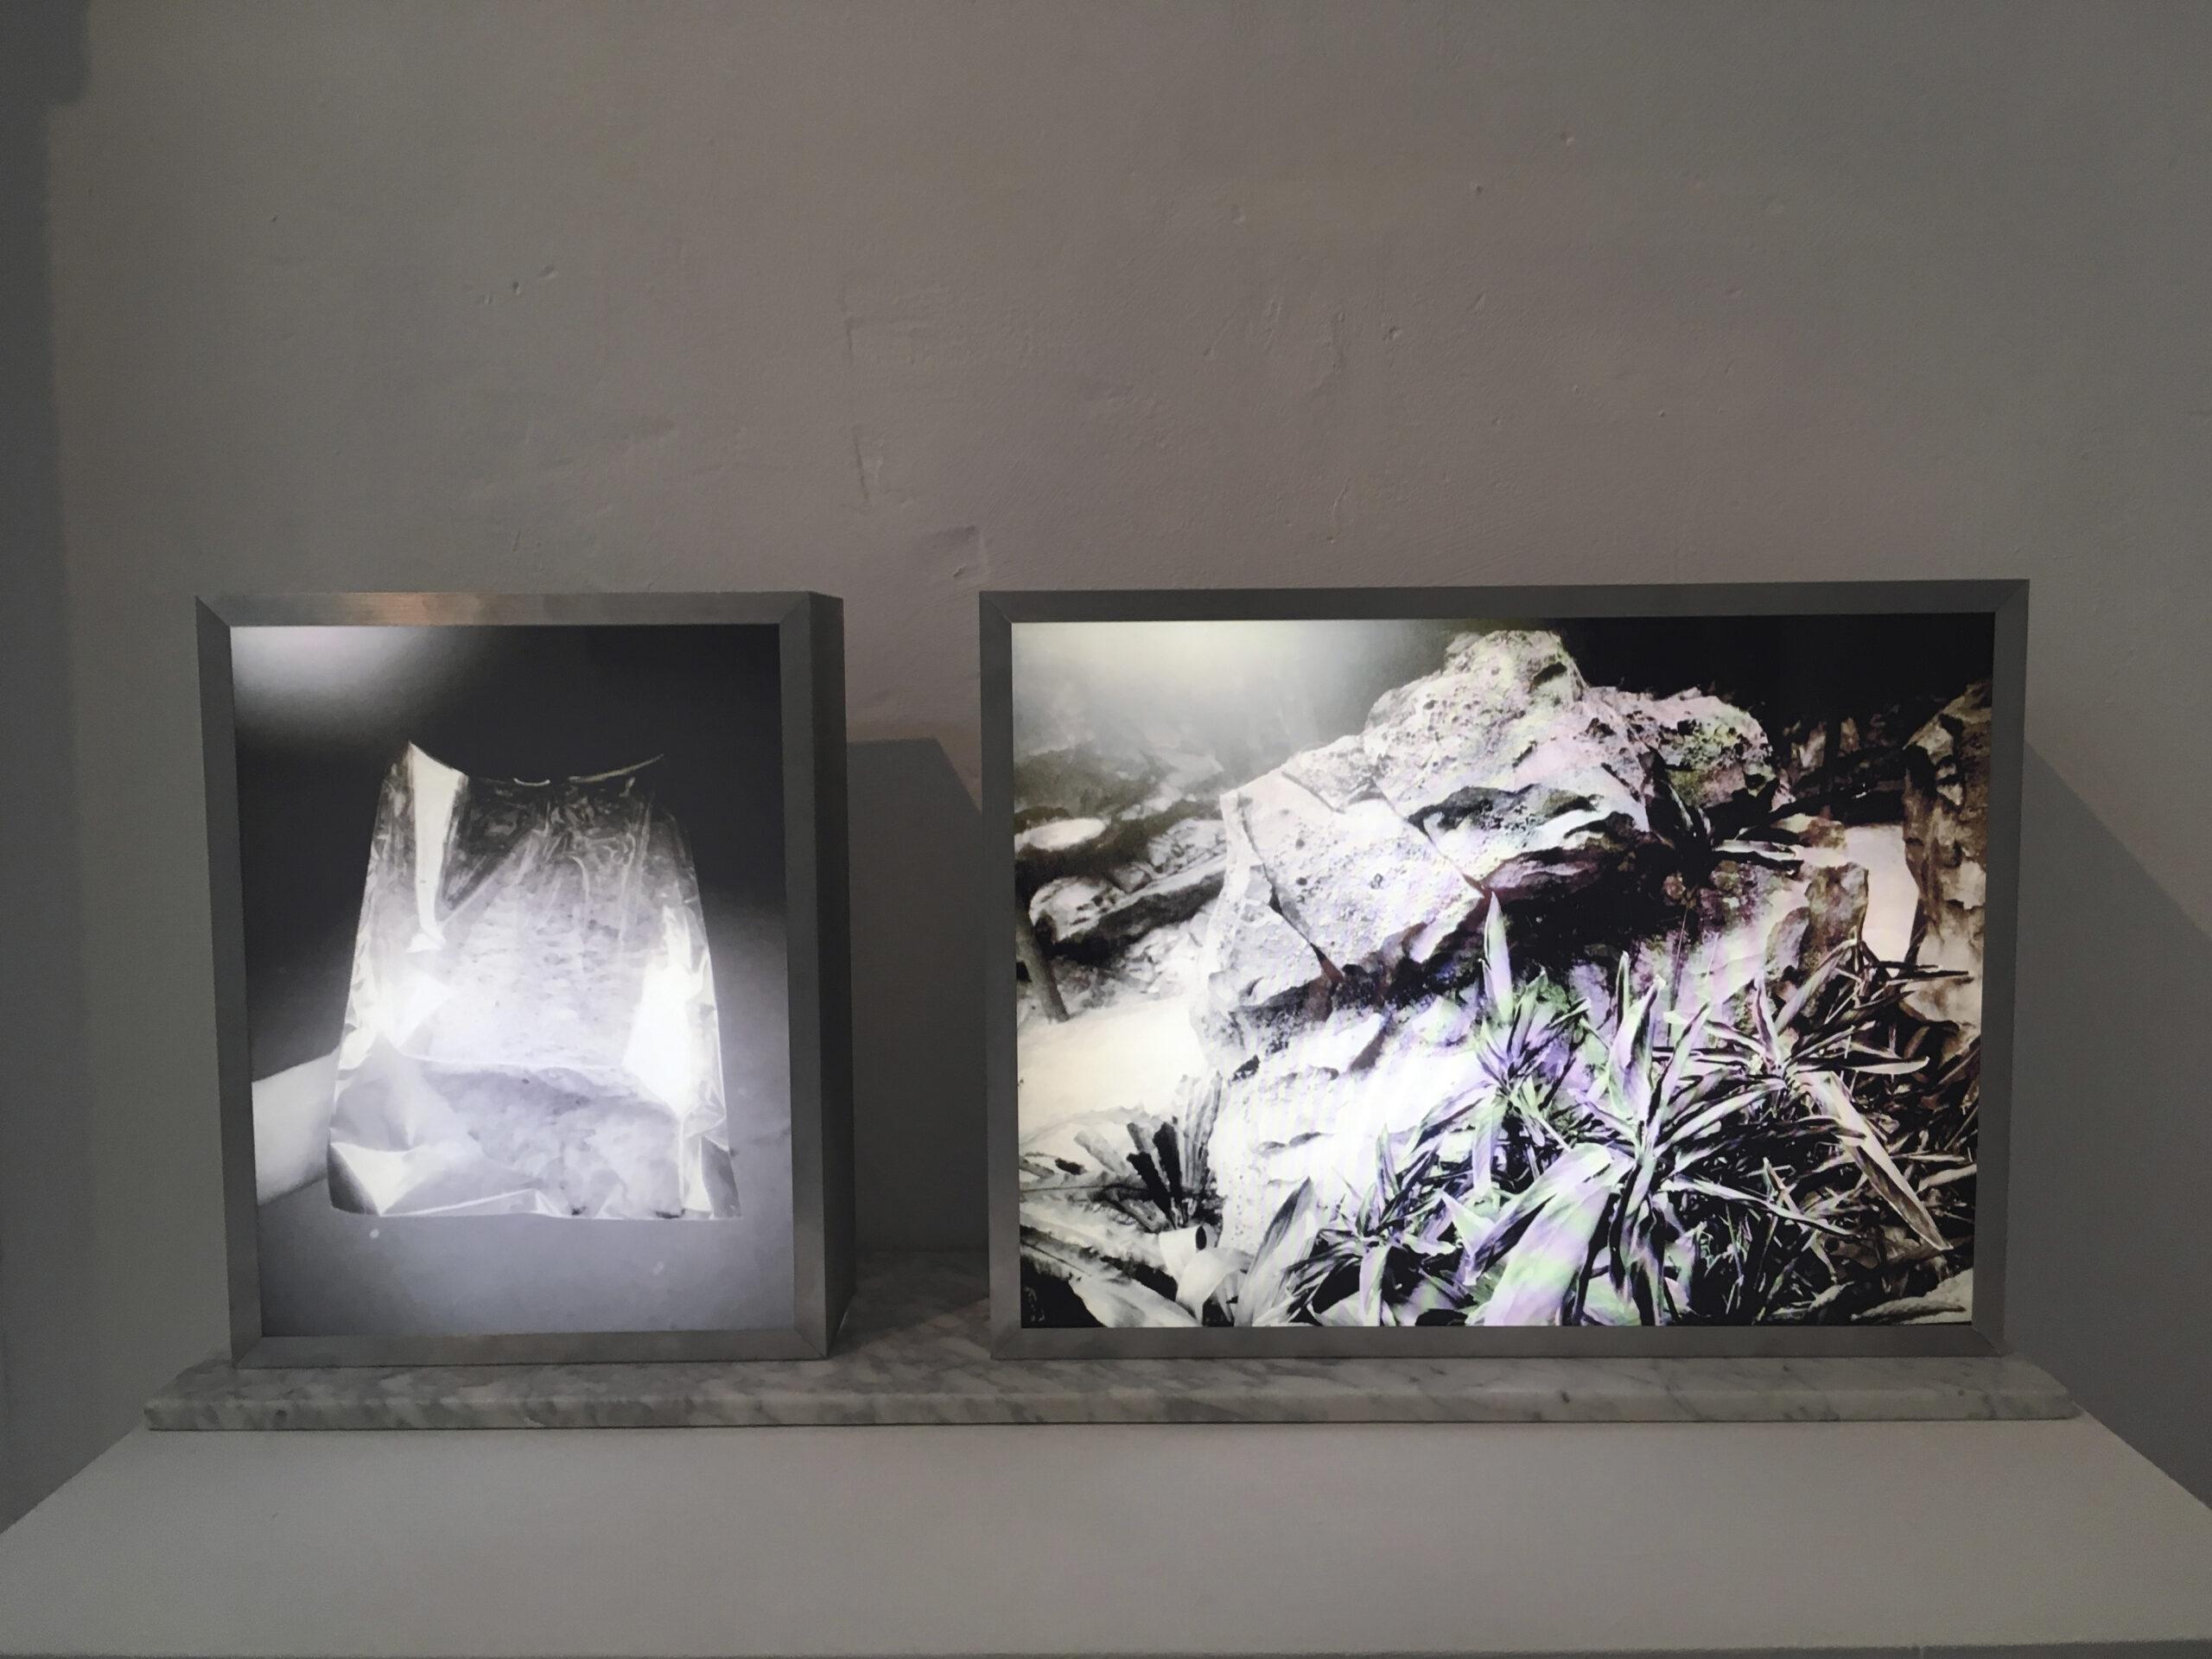 Pia Kintrup_the stone_the nonexistent areas are of particular interest_Print auf Aluminium Lightbox_45 cm x 60 cm x 15 cm_install01